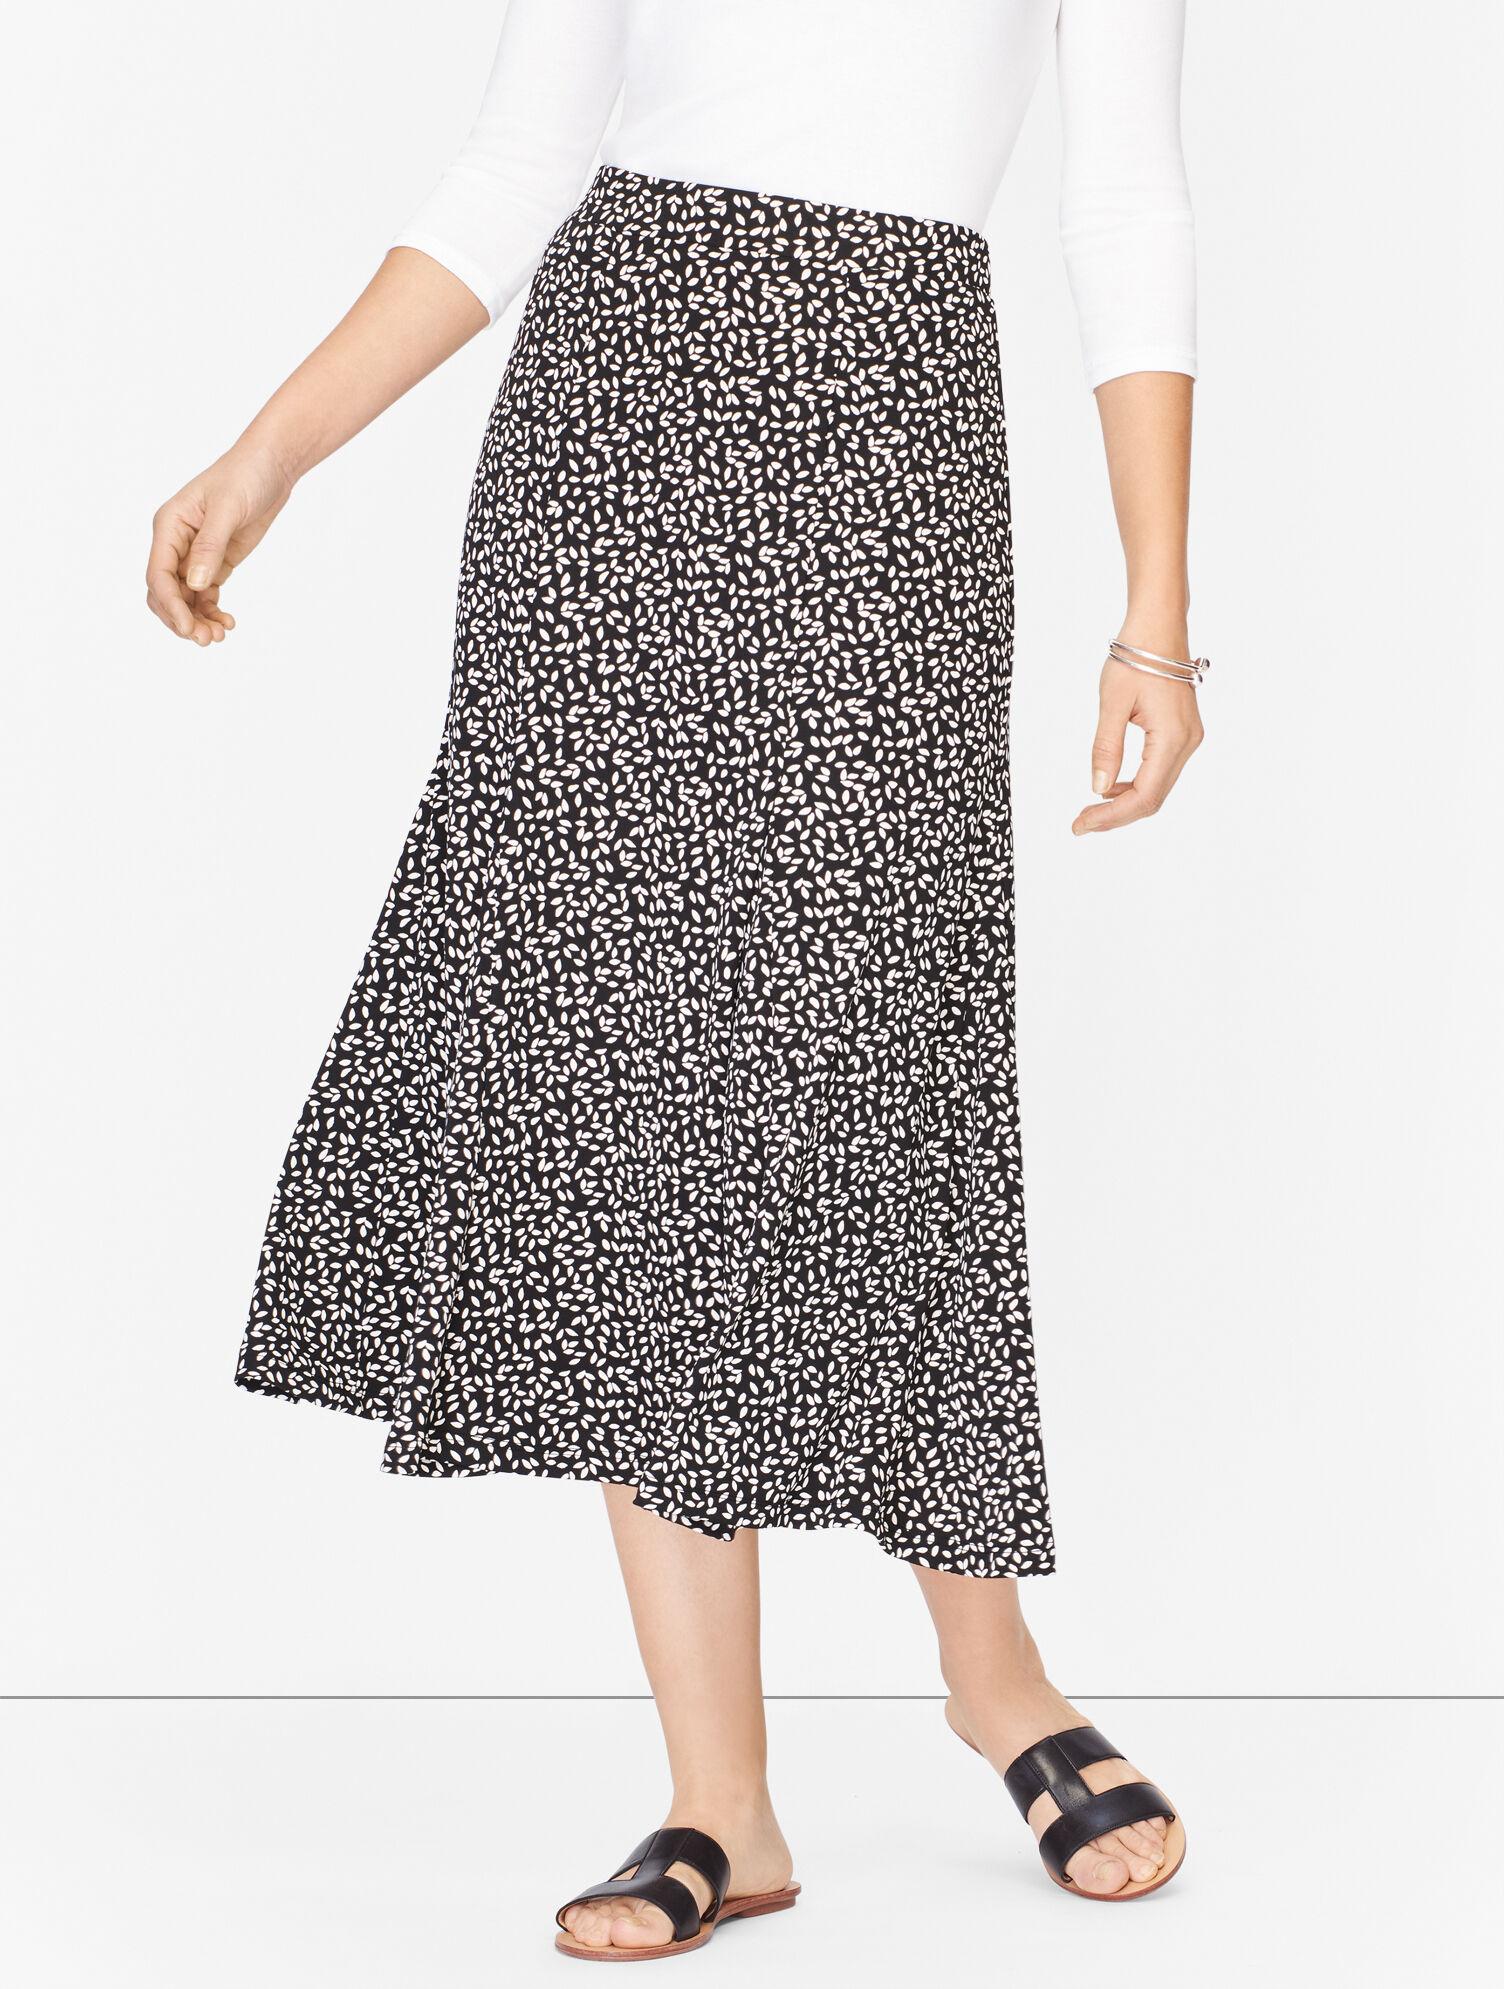 New TALBOTS Womens Petites Mid-Rise Black Colour Tag Price $ 94.50 70514A